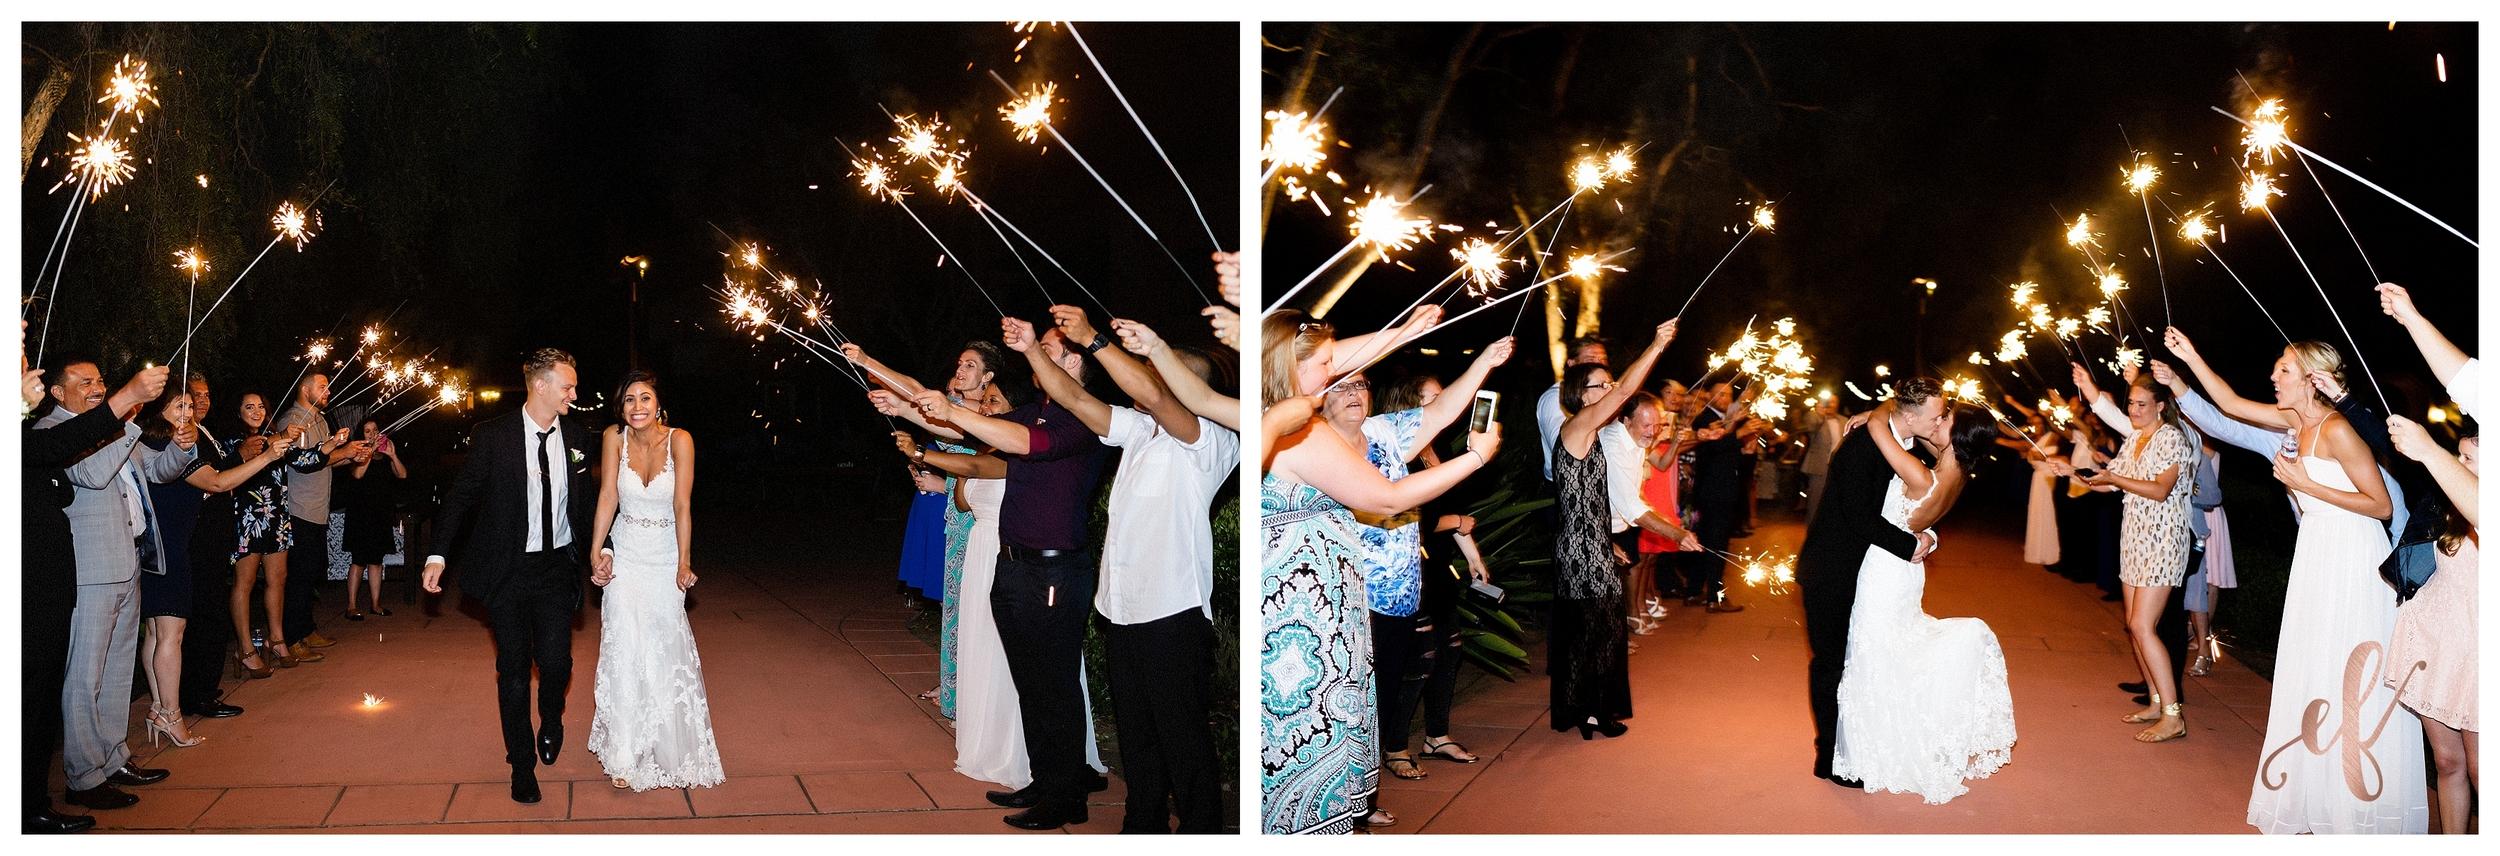 San Diego Wedding Photographer   Ernie & Fiona Photography   Bride   Groom   Sparklers